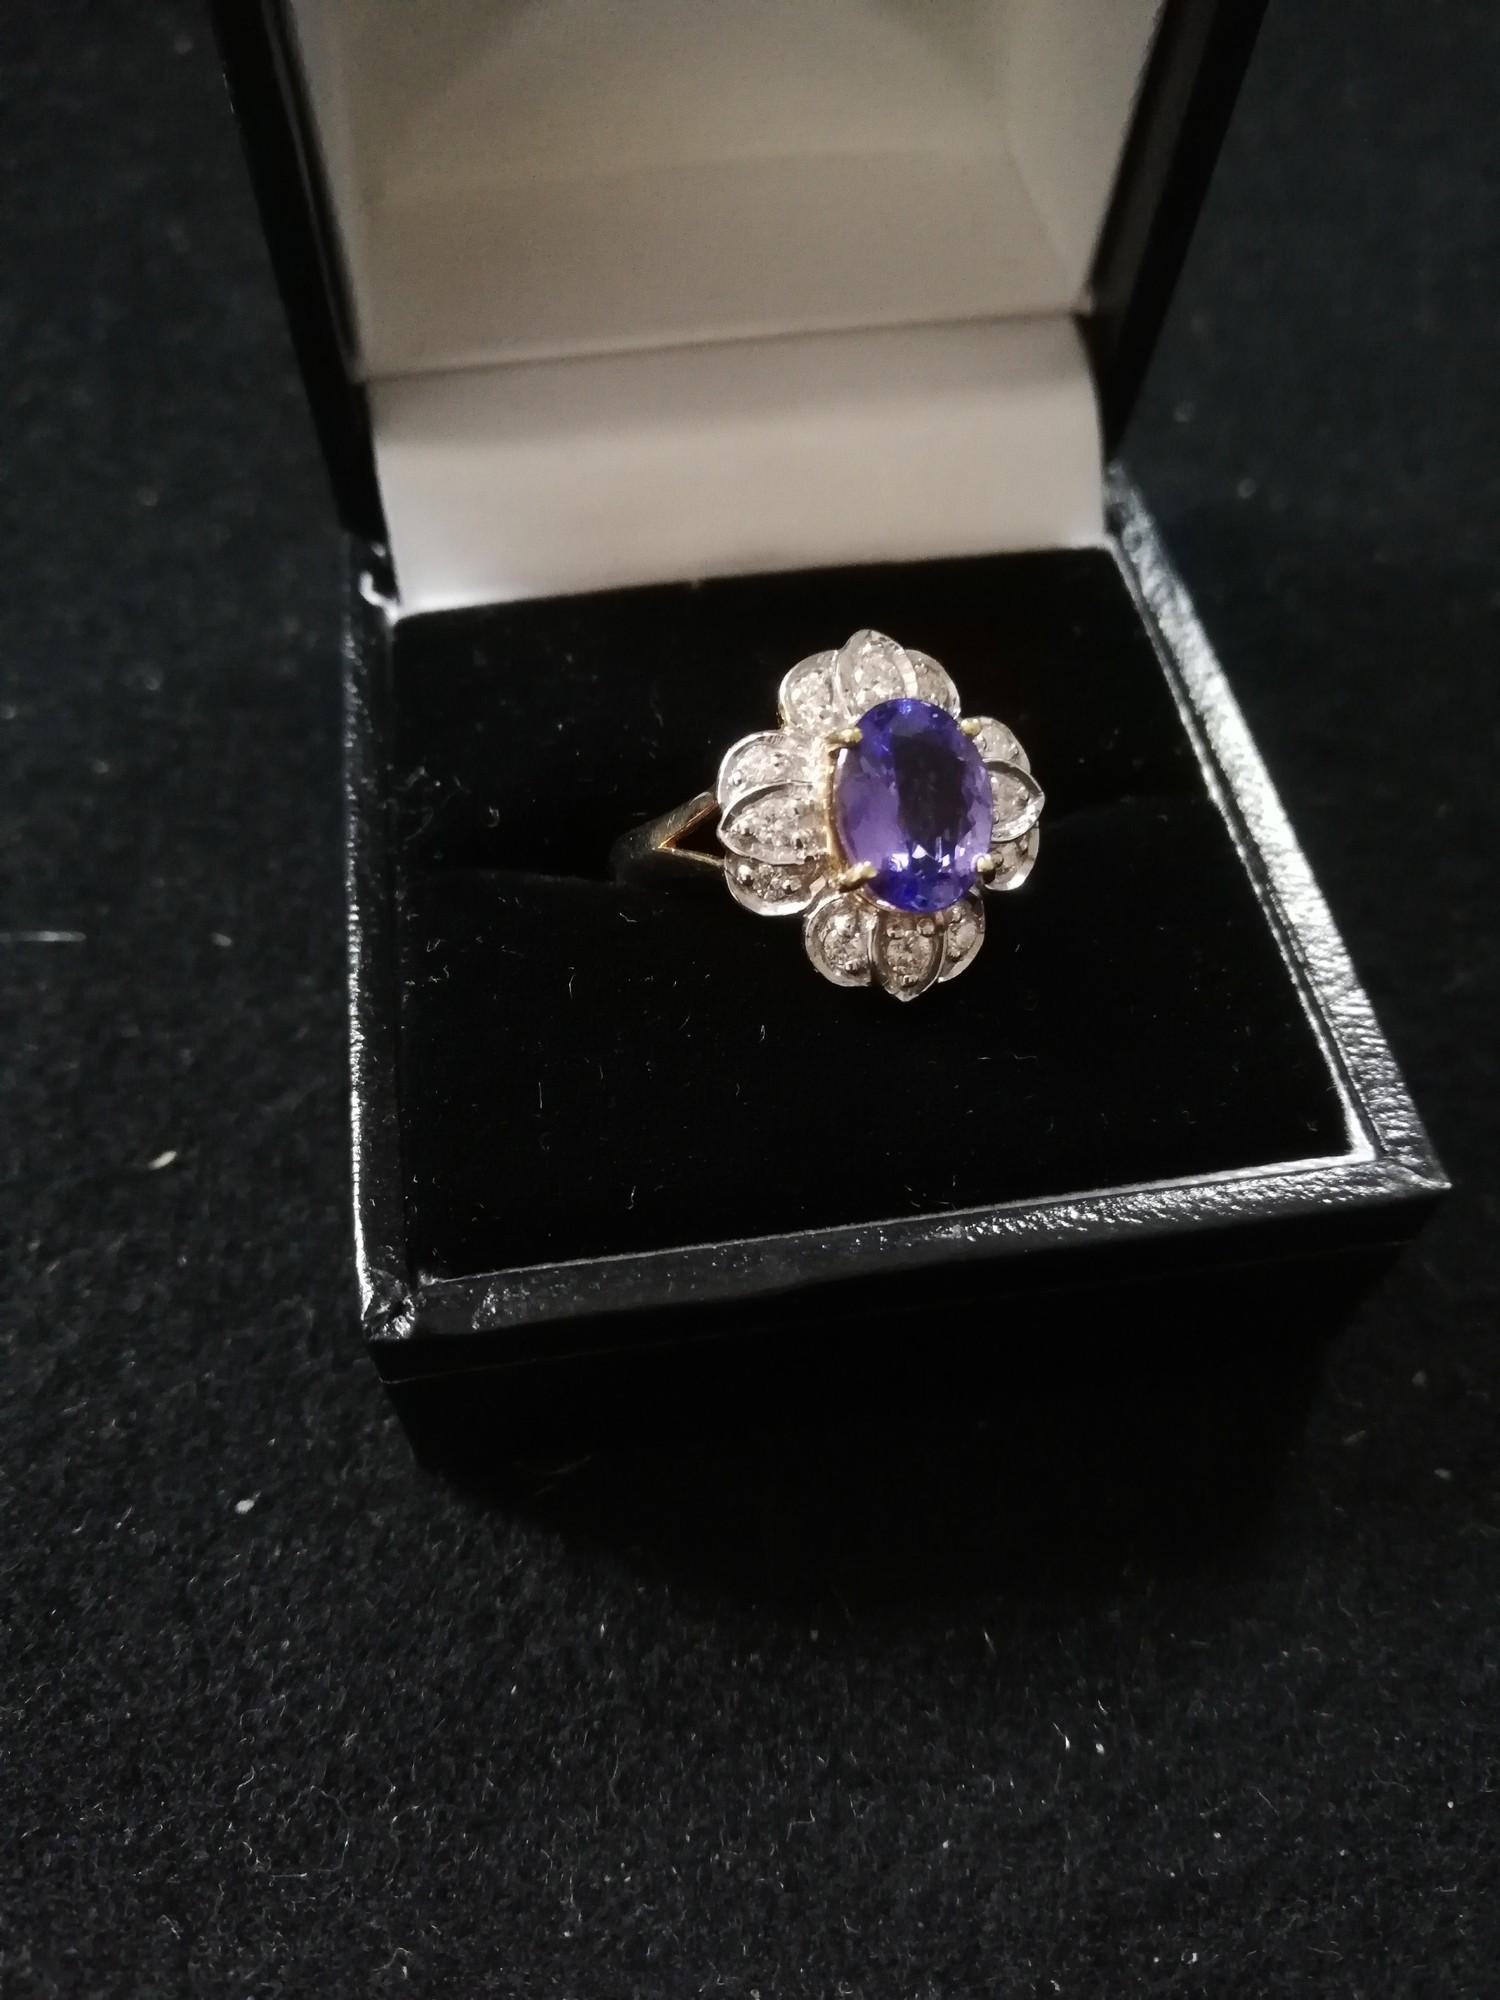 18ct Tanzanite and Diamond ring - Image 2 of 2